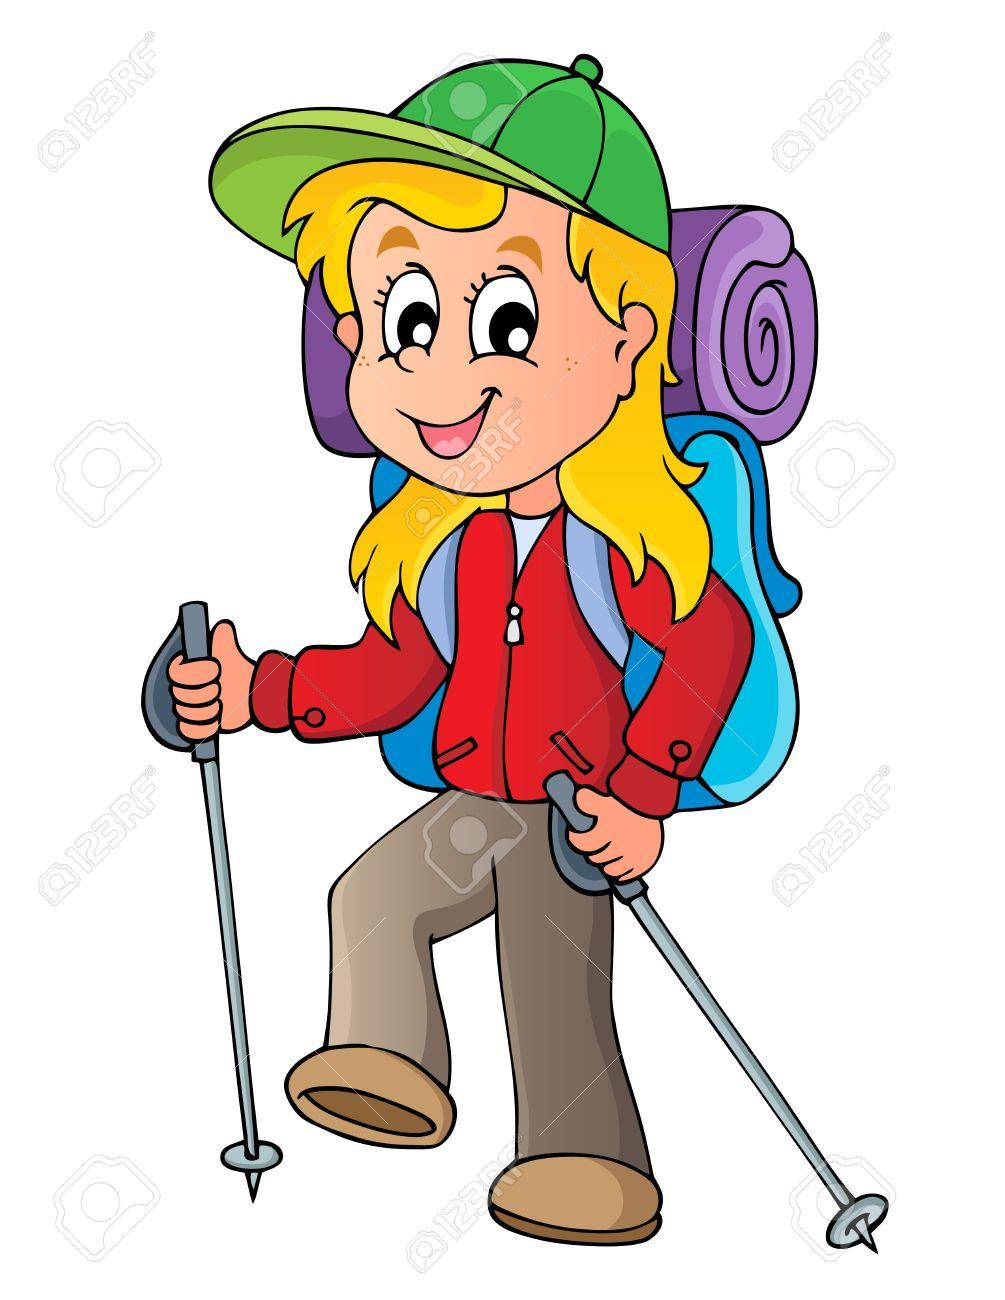 Hiking free download best. Hiker clipart adventurous girl